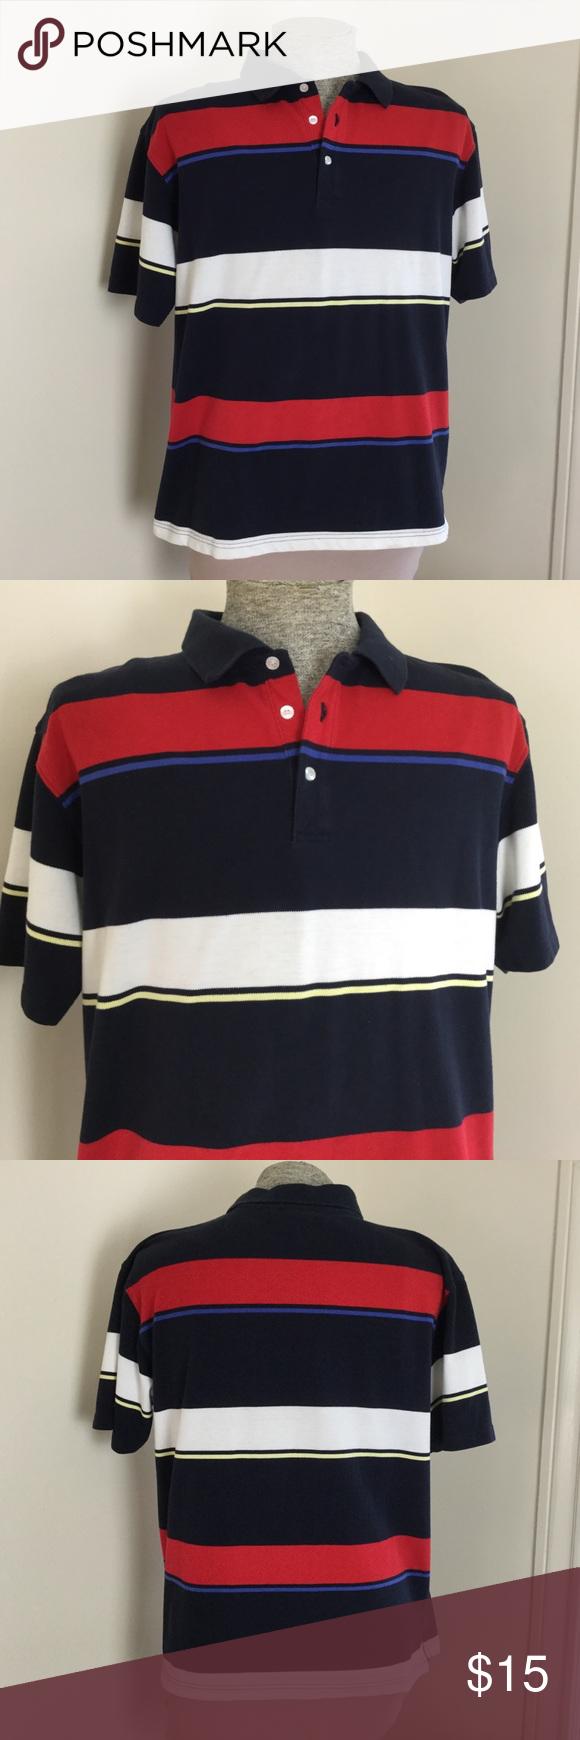 0603b1fe8 Bugle Boy Mens XL Striped Polo Shirt Great looking shirt. Bugle Boy Striped  XL Excellent Condition 60% Cotton, 40% polyester Measurements: Laying Flat  Pit ...